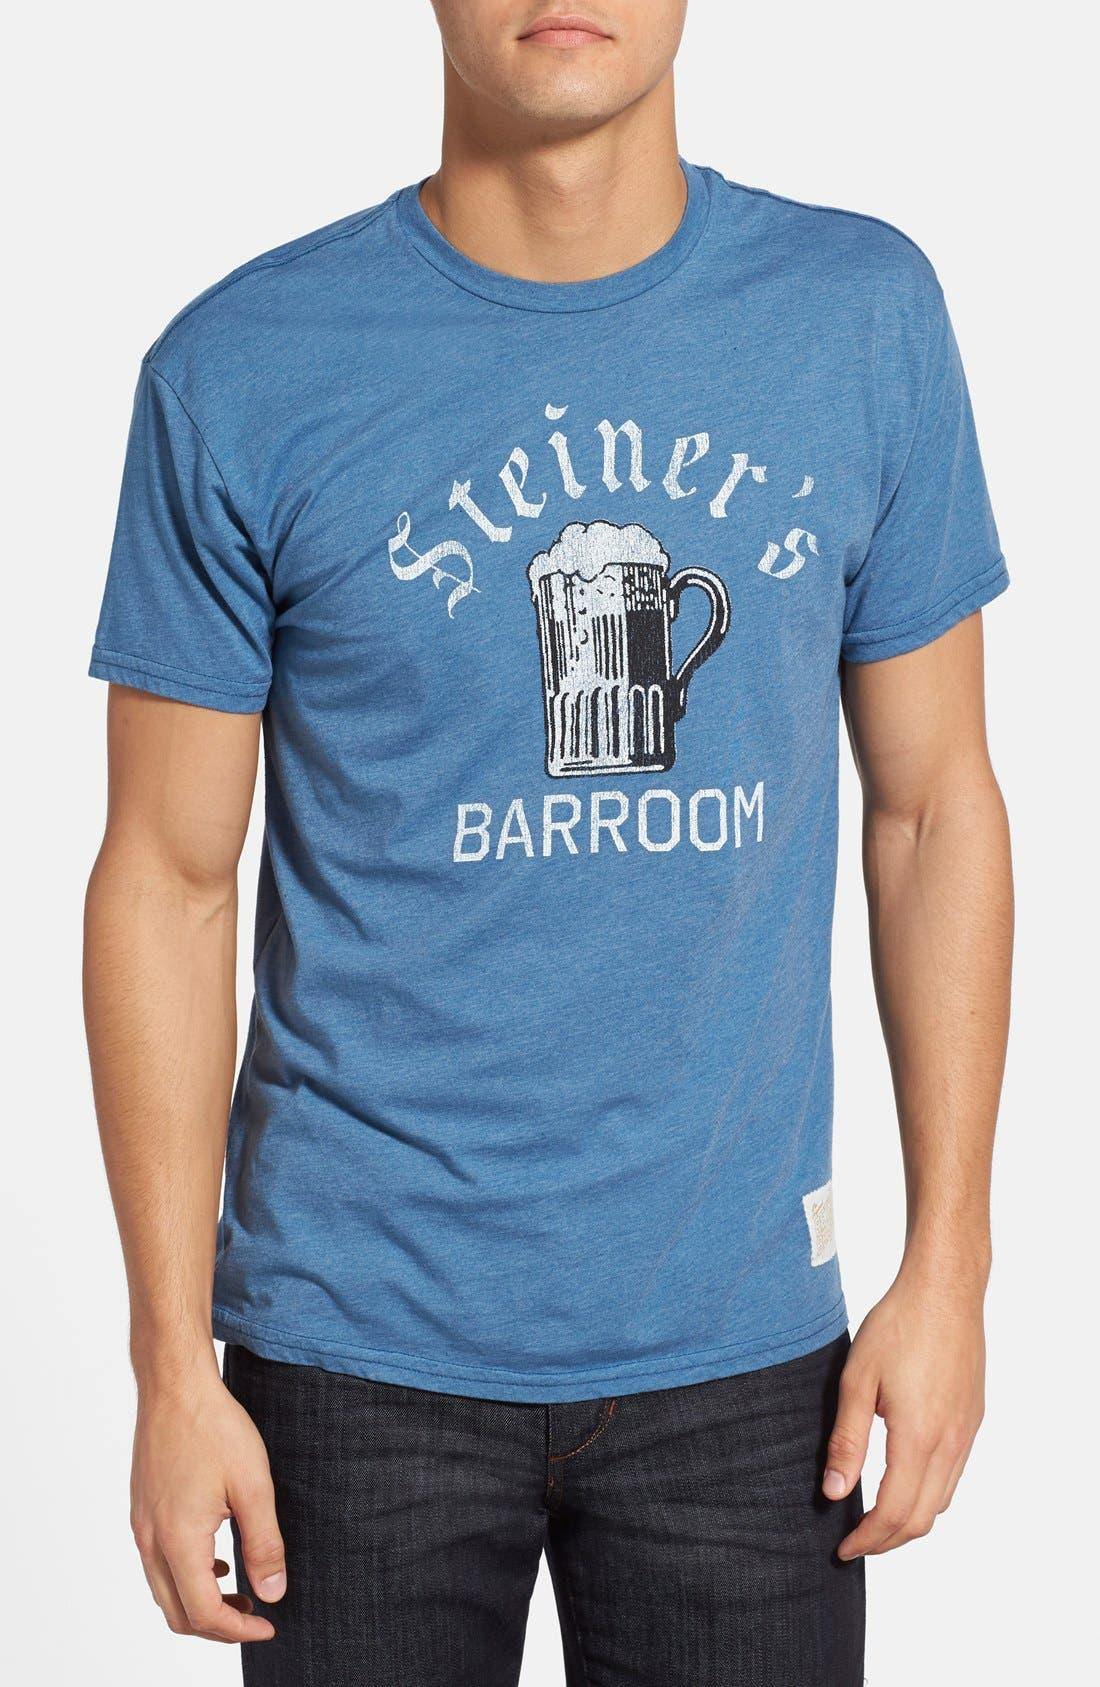 Alternate Image 1 Selected - Retro Brand 'Steiner's Bar Room' Slim Fit Graphic T-Shirt